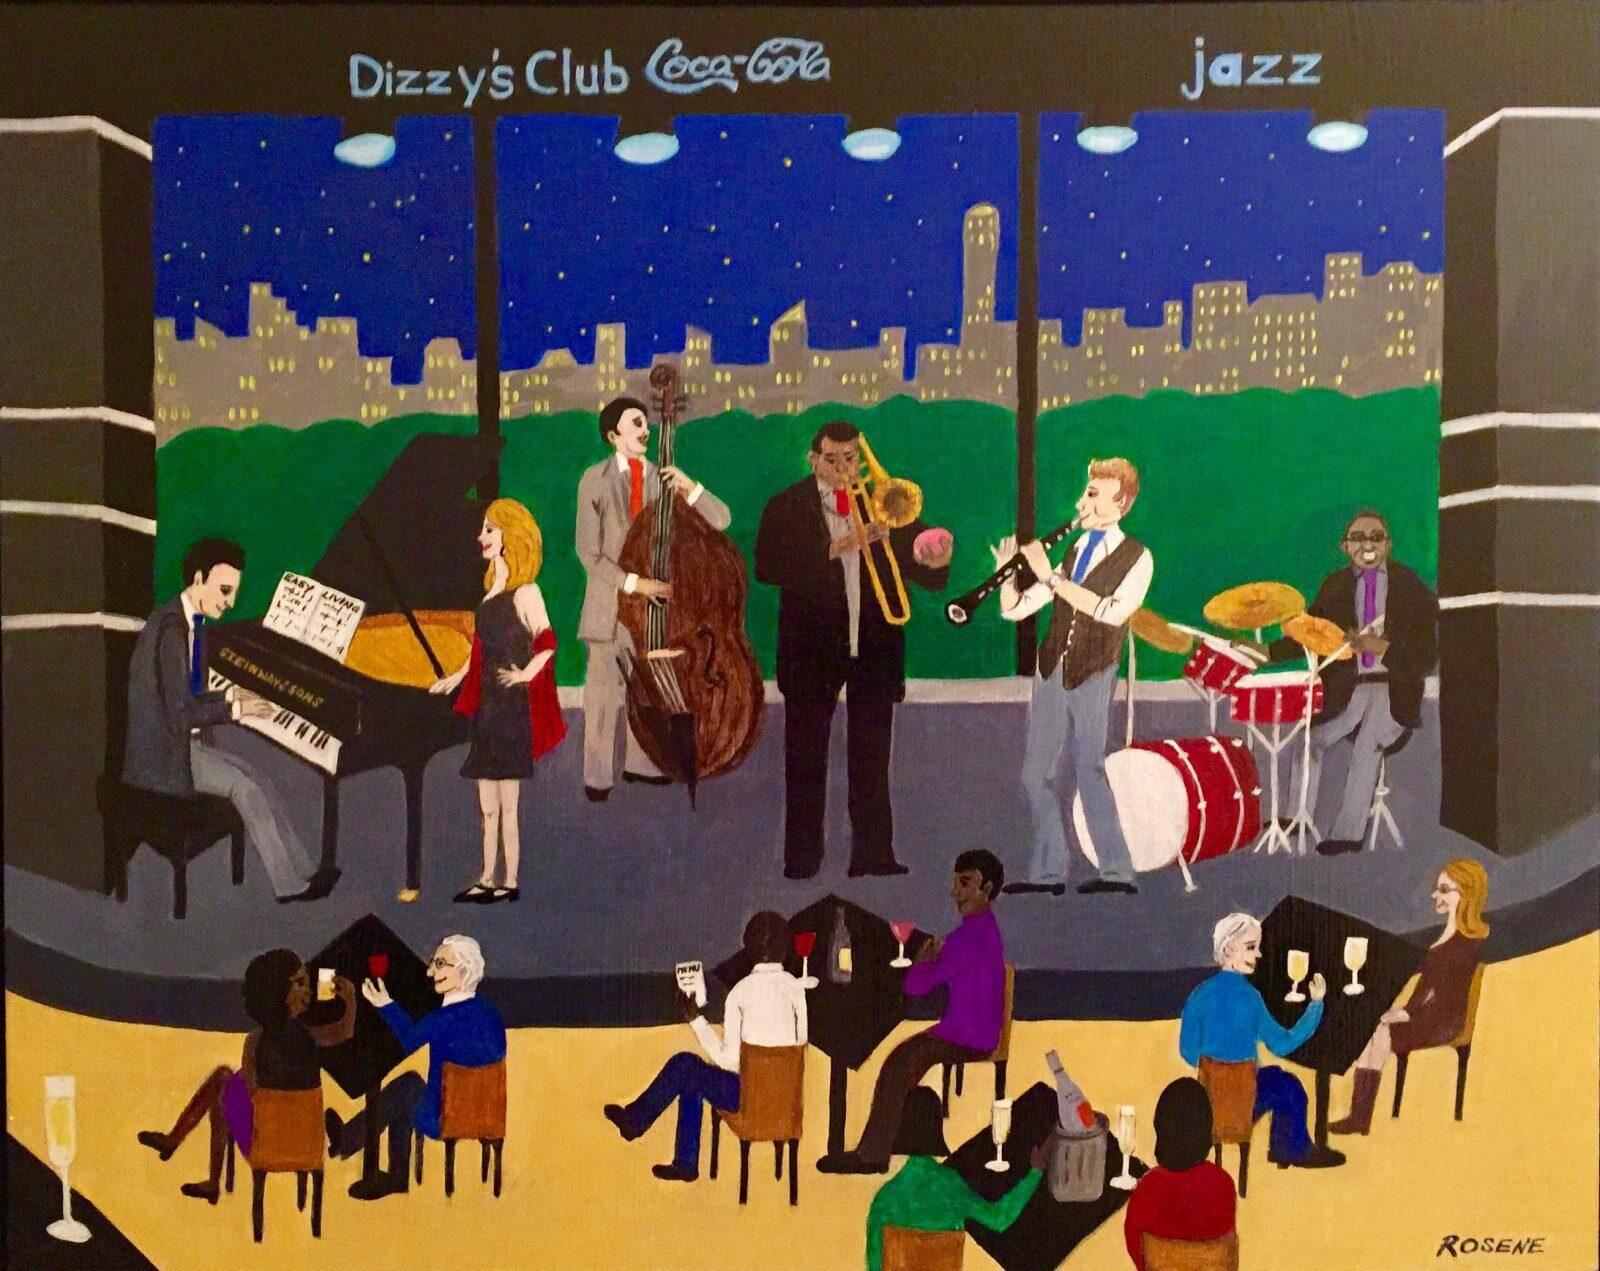 Dizzy's Club Coca-Cola by Barbara Rosene